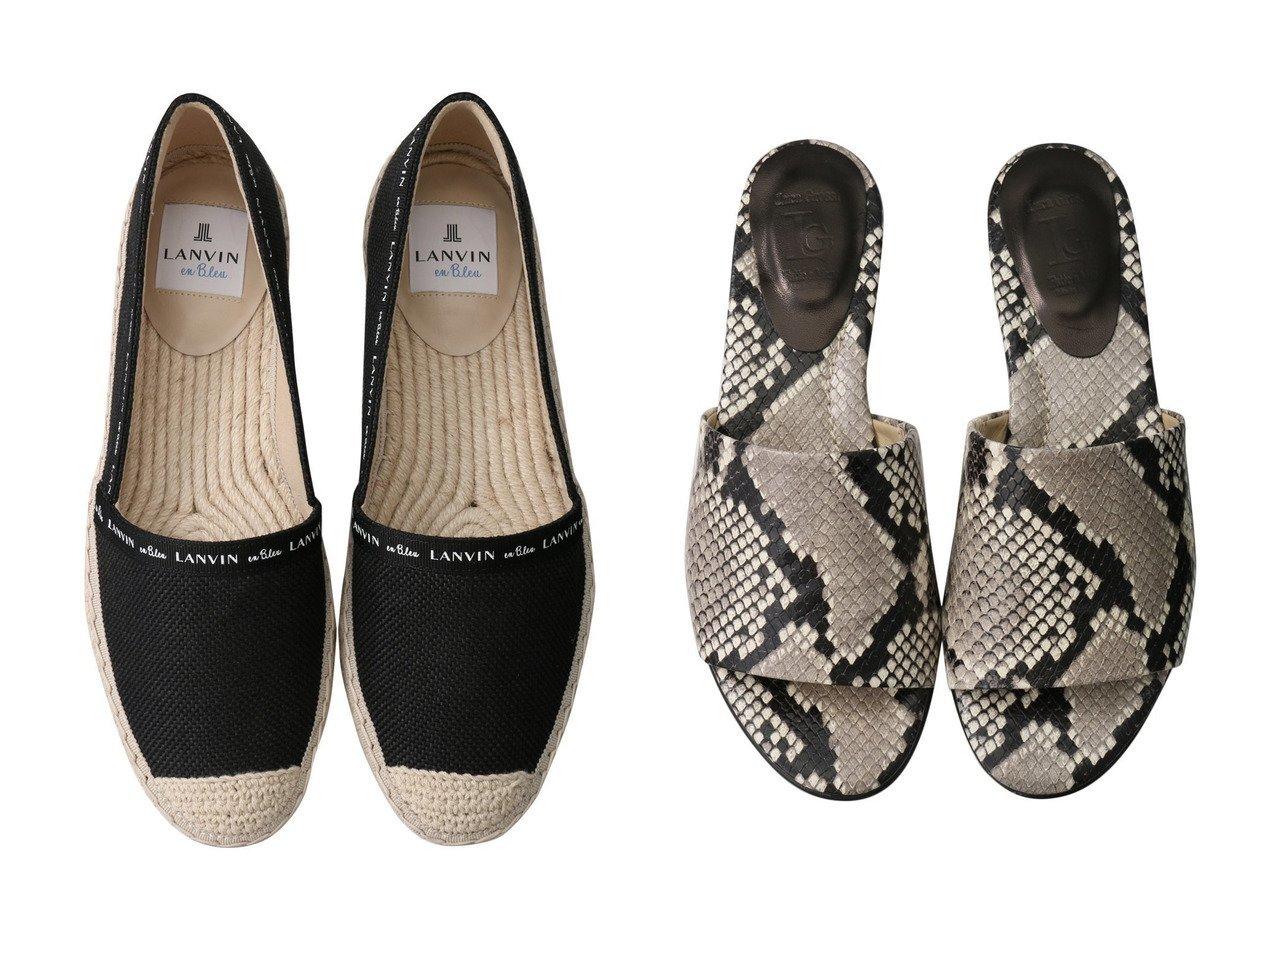 【LucaGrossi/ルカグロッシ】のパイソンフラットサンダル&【LANVIN en Bleu/ランバン オン ブルー】のエスパドリーユ 【シューズ・靴】おすすめ!人気、トレンド・レディースファッションの通販  おすすめで人気の流行・トレンド、ファッションの通販商品 メンズファッション・キッズファッション・インテリア・家具・レディースファッション・服の通販 founy(ファニー) https://founy.com/ ファッション Fashion レディースファッション WOMEN サンダル パイソン 人気 S/S・春夏 SS・Spring/Summer シューズ フラット 春 Spring |ID:crp329100000034617